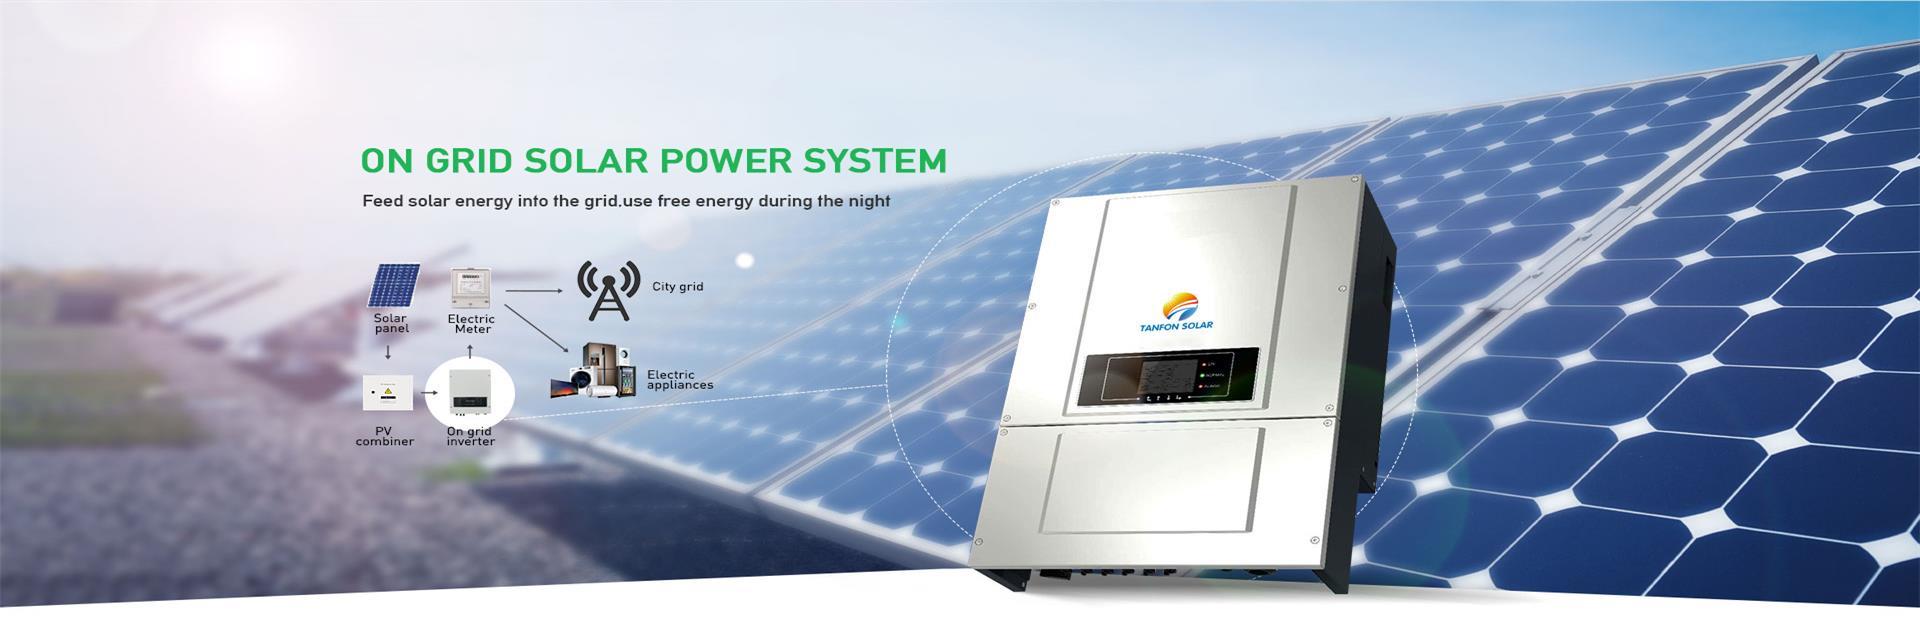 full solar power system set work with diesel generator